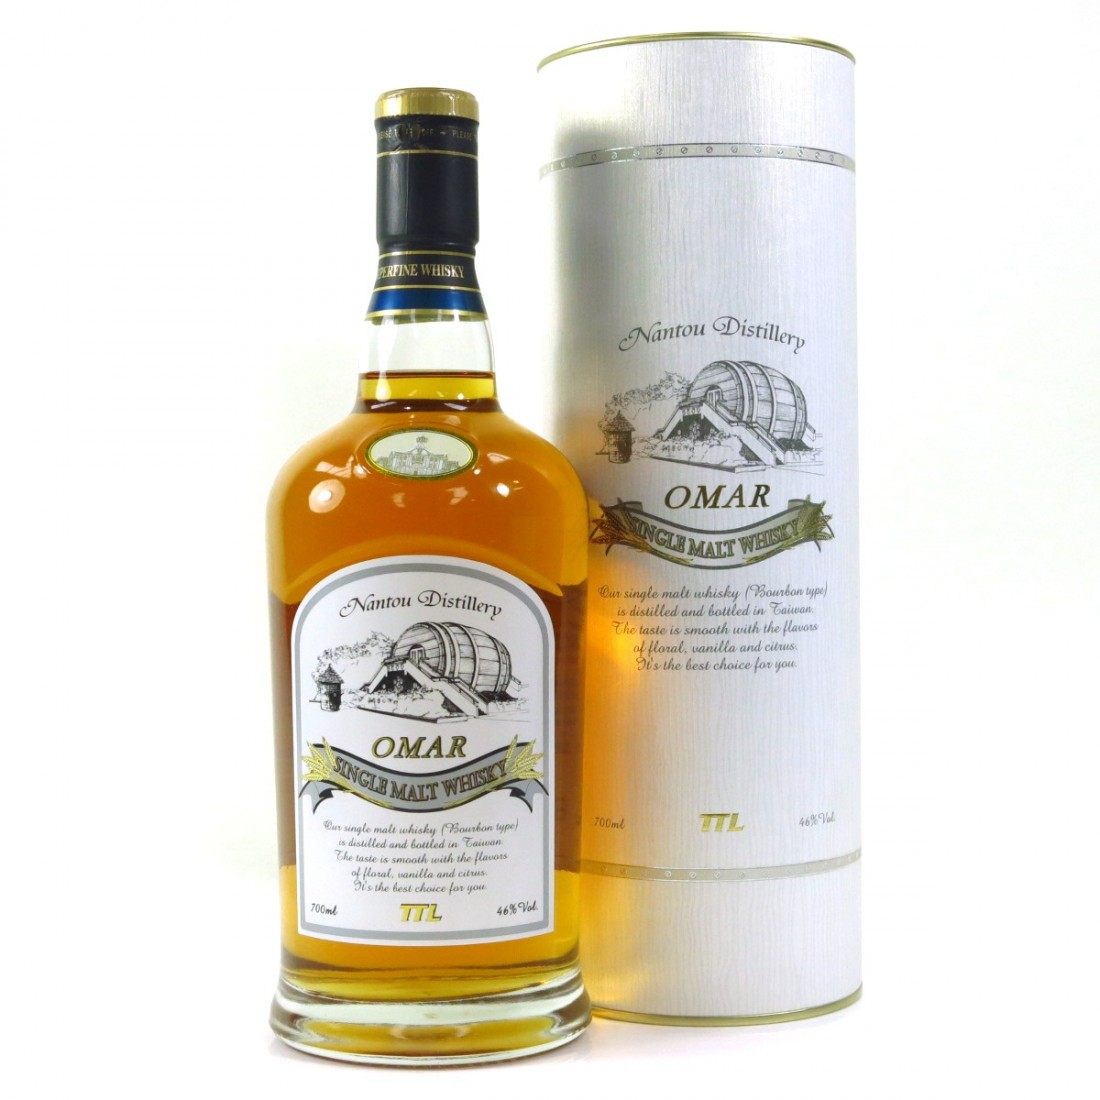 Nantou Omar Single Malt Whisky (Bourbon Cask) Taiwan